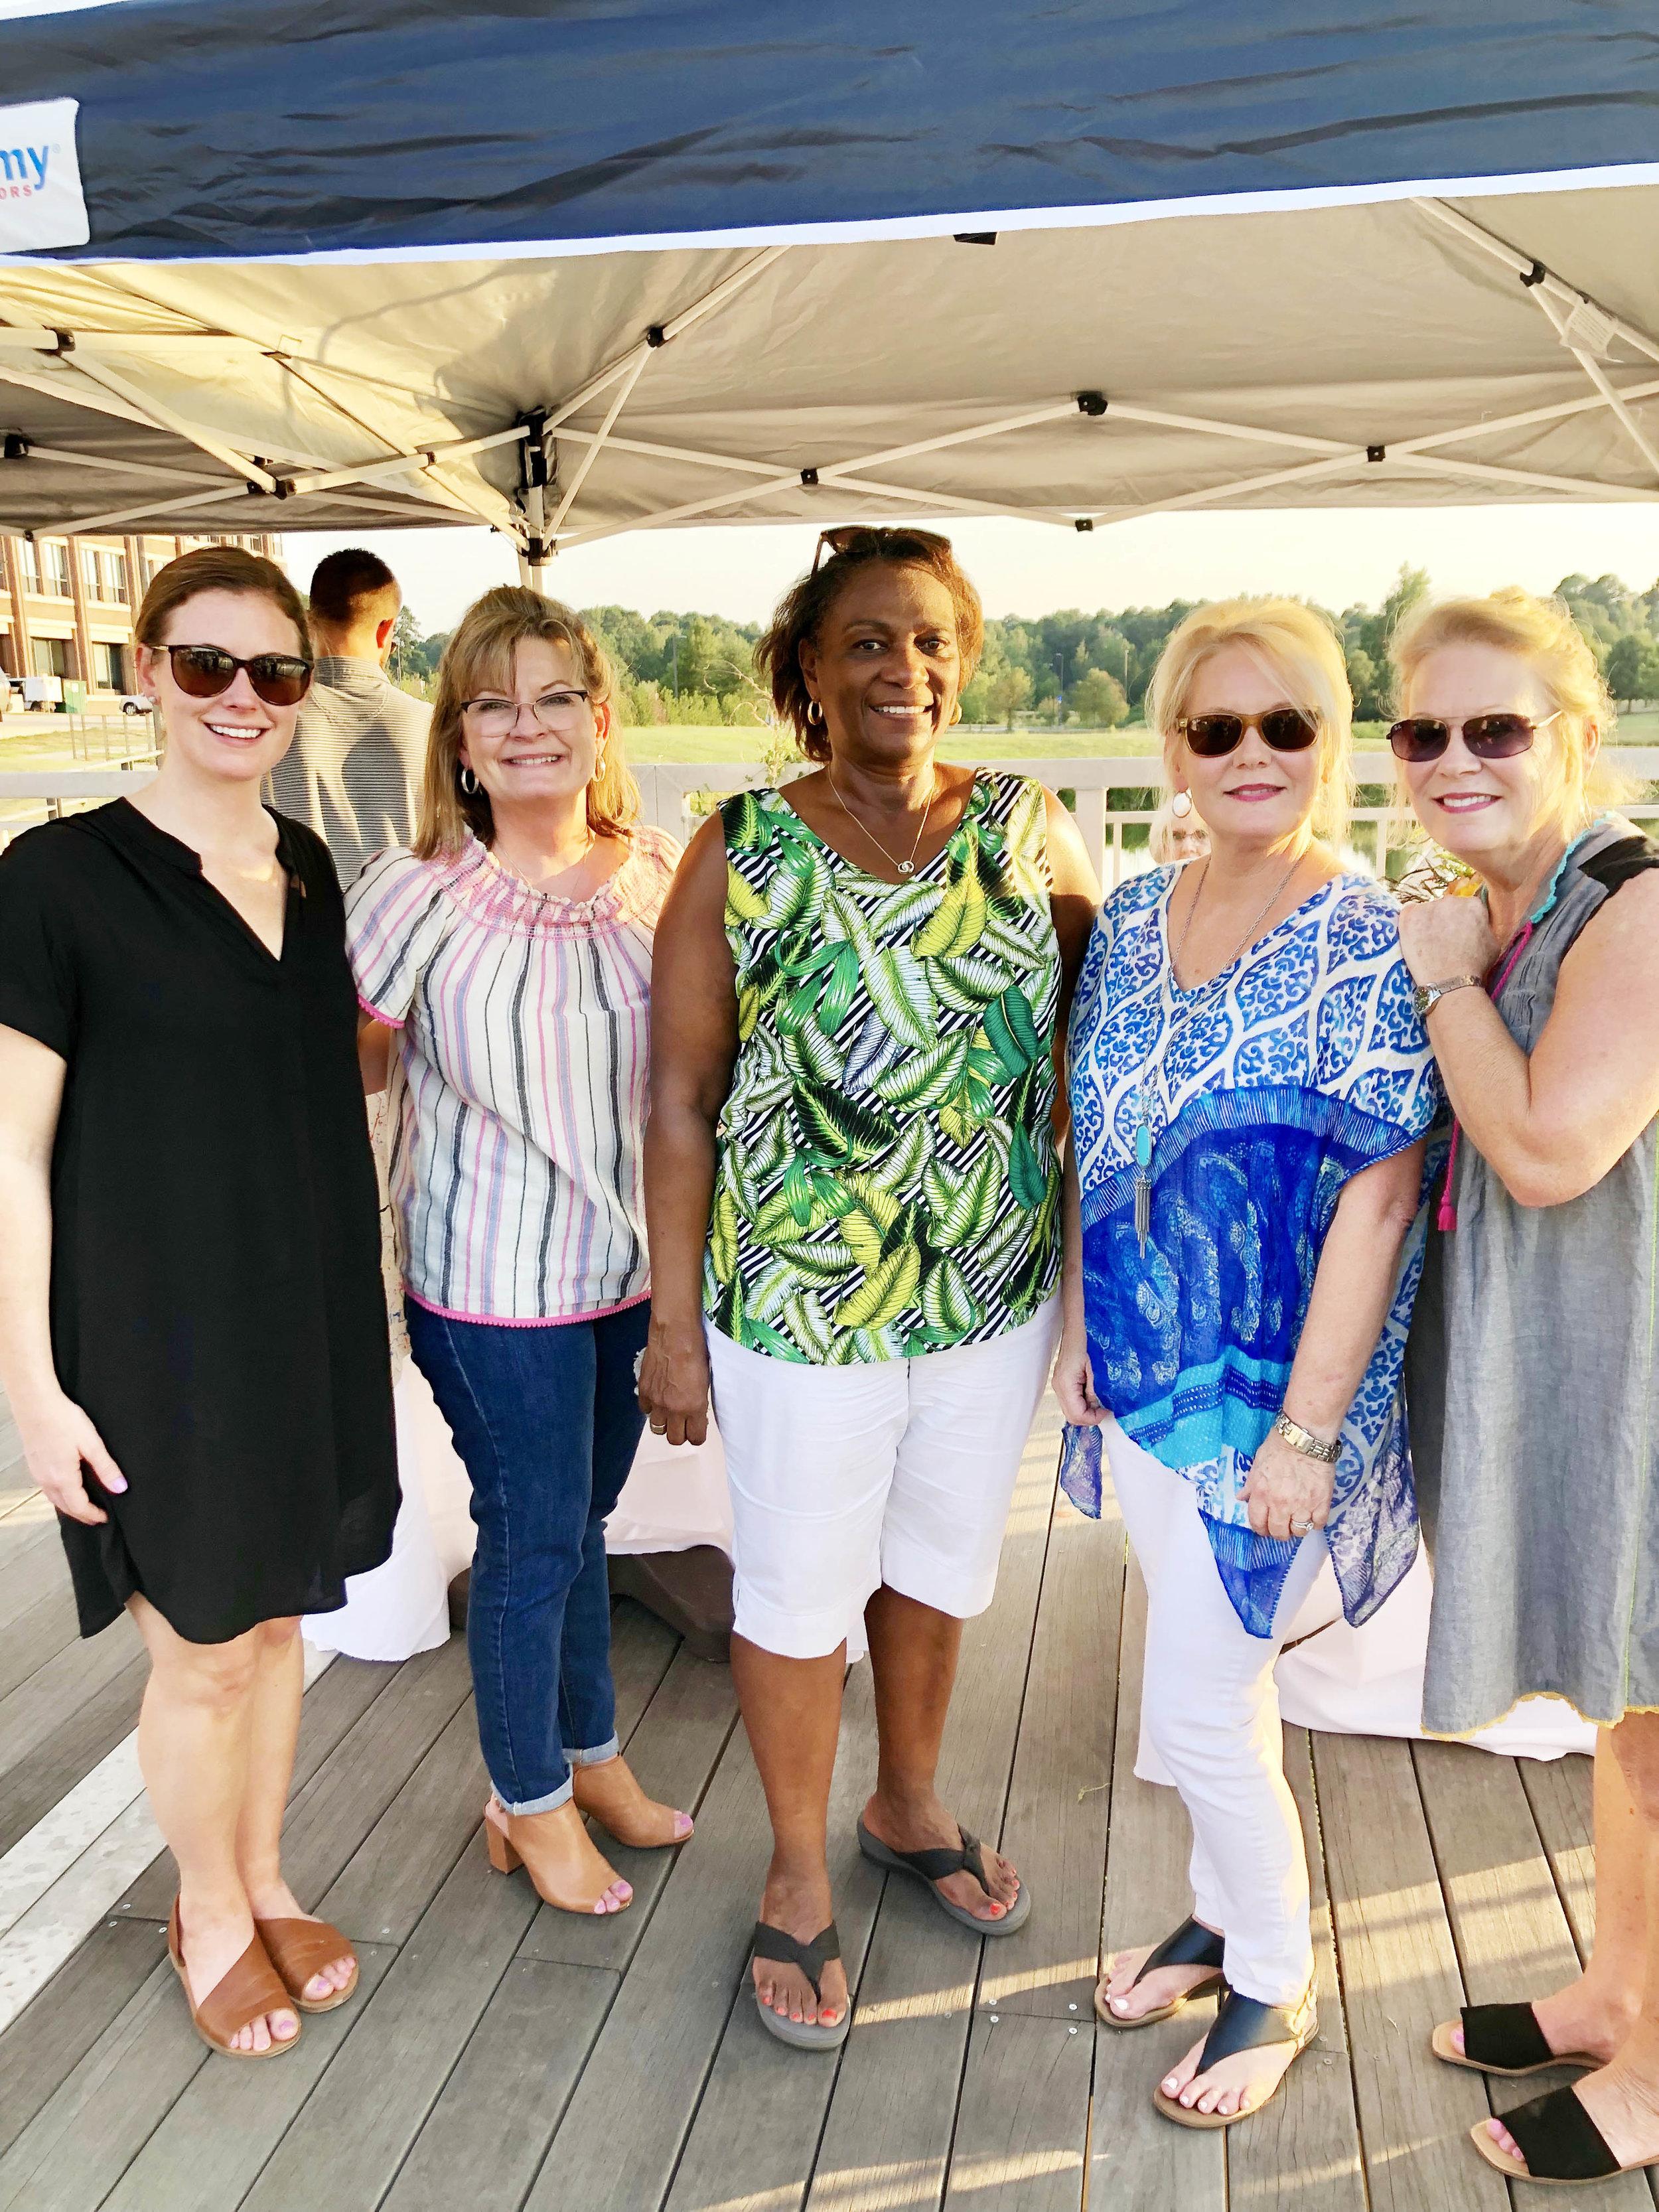 Lauren Richards, Brenda Sutton, Mary Washington, Jerri Raney and Terrie Arnold